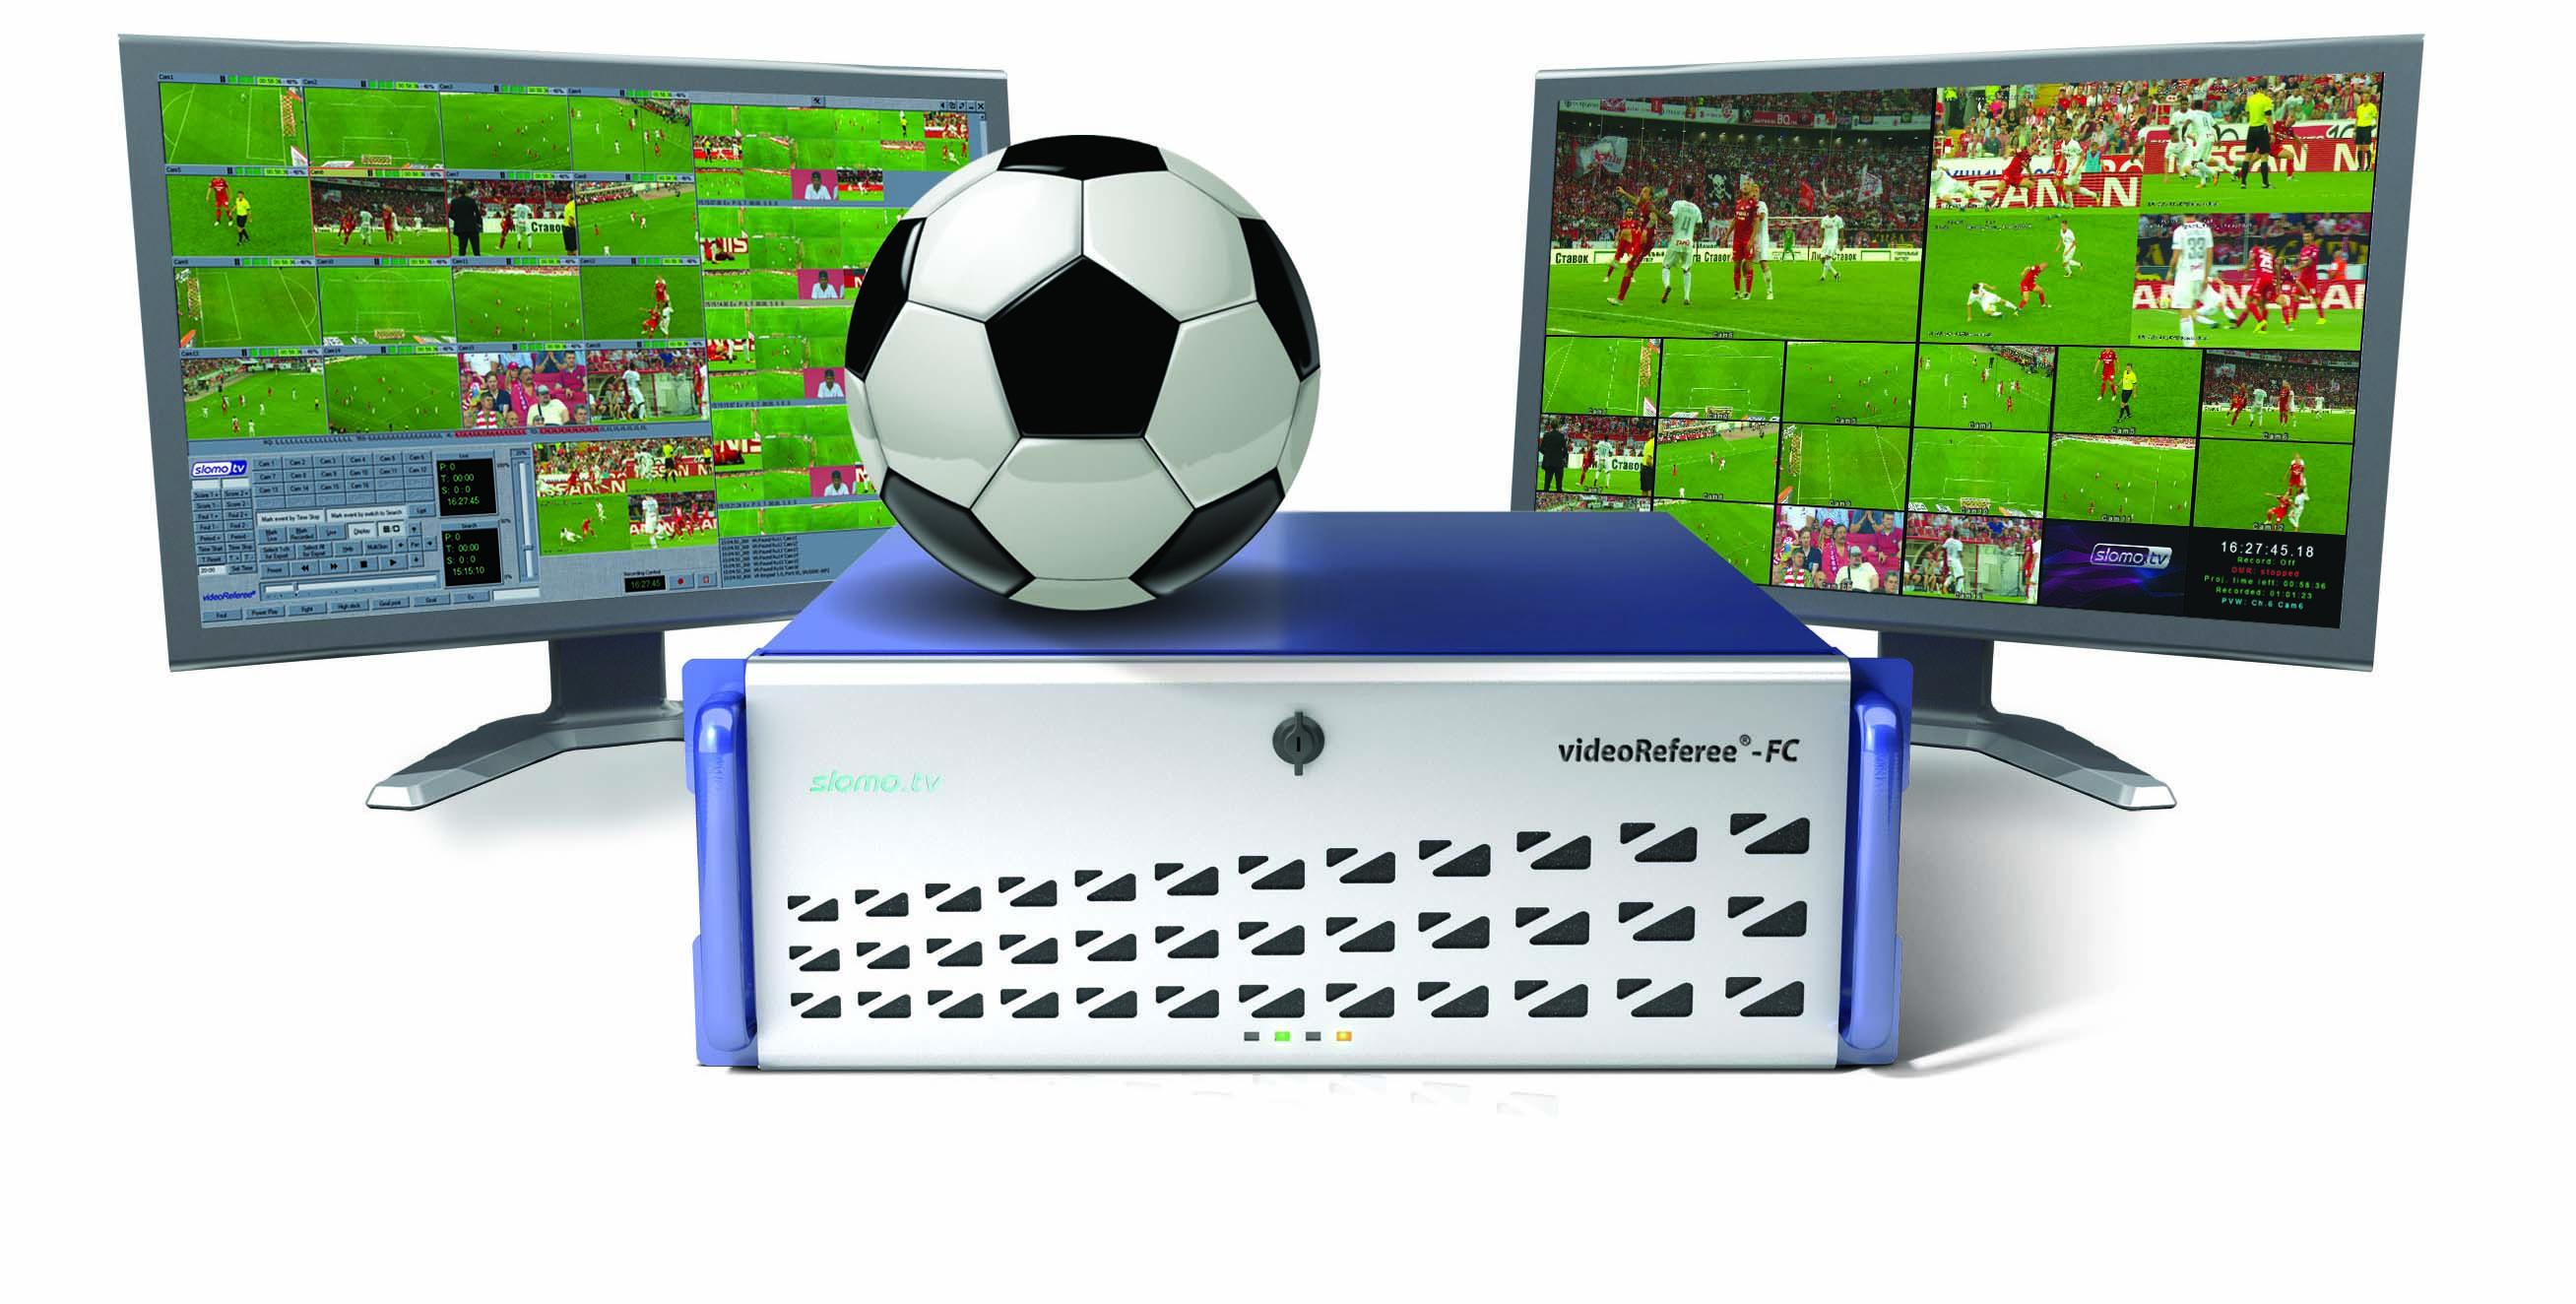 8730d97de04 videoReferee®-FC – VAR system - IABM